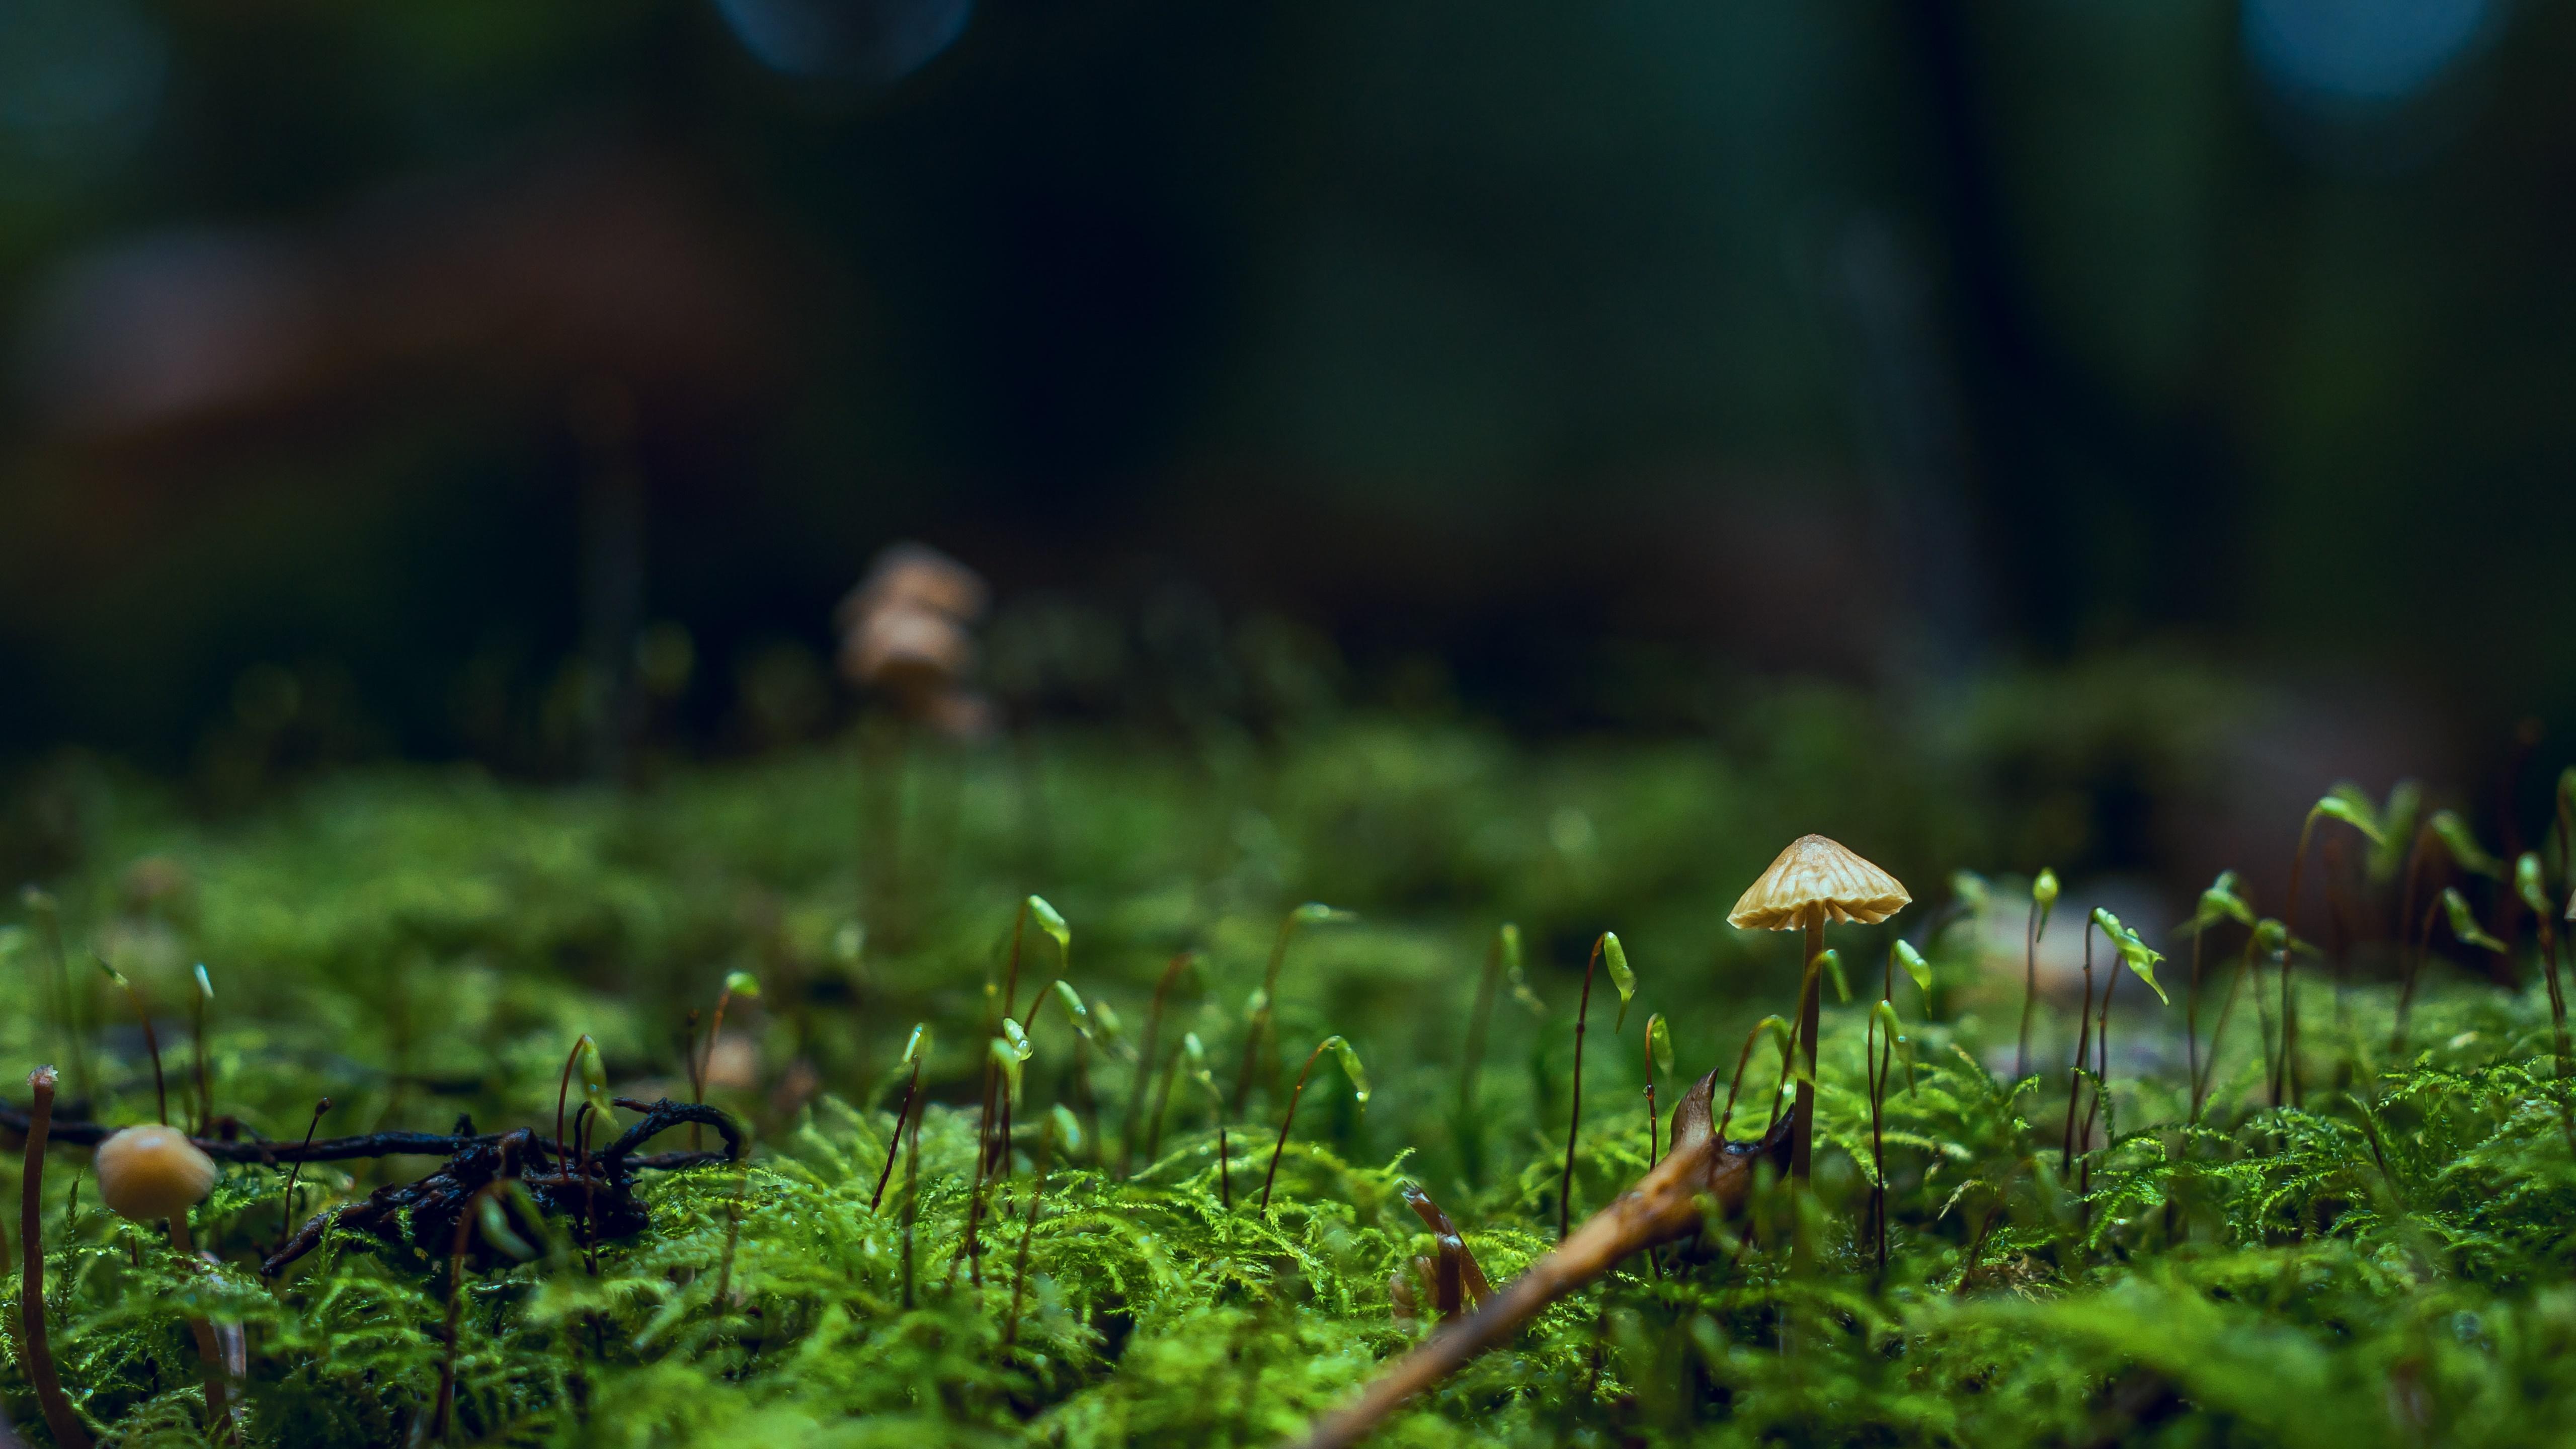 Moss macro photo wallpaper